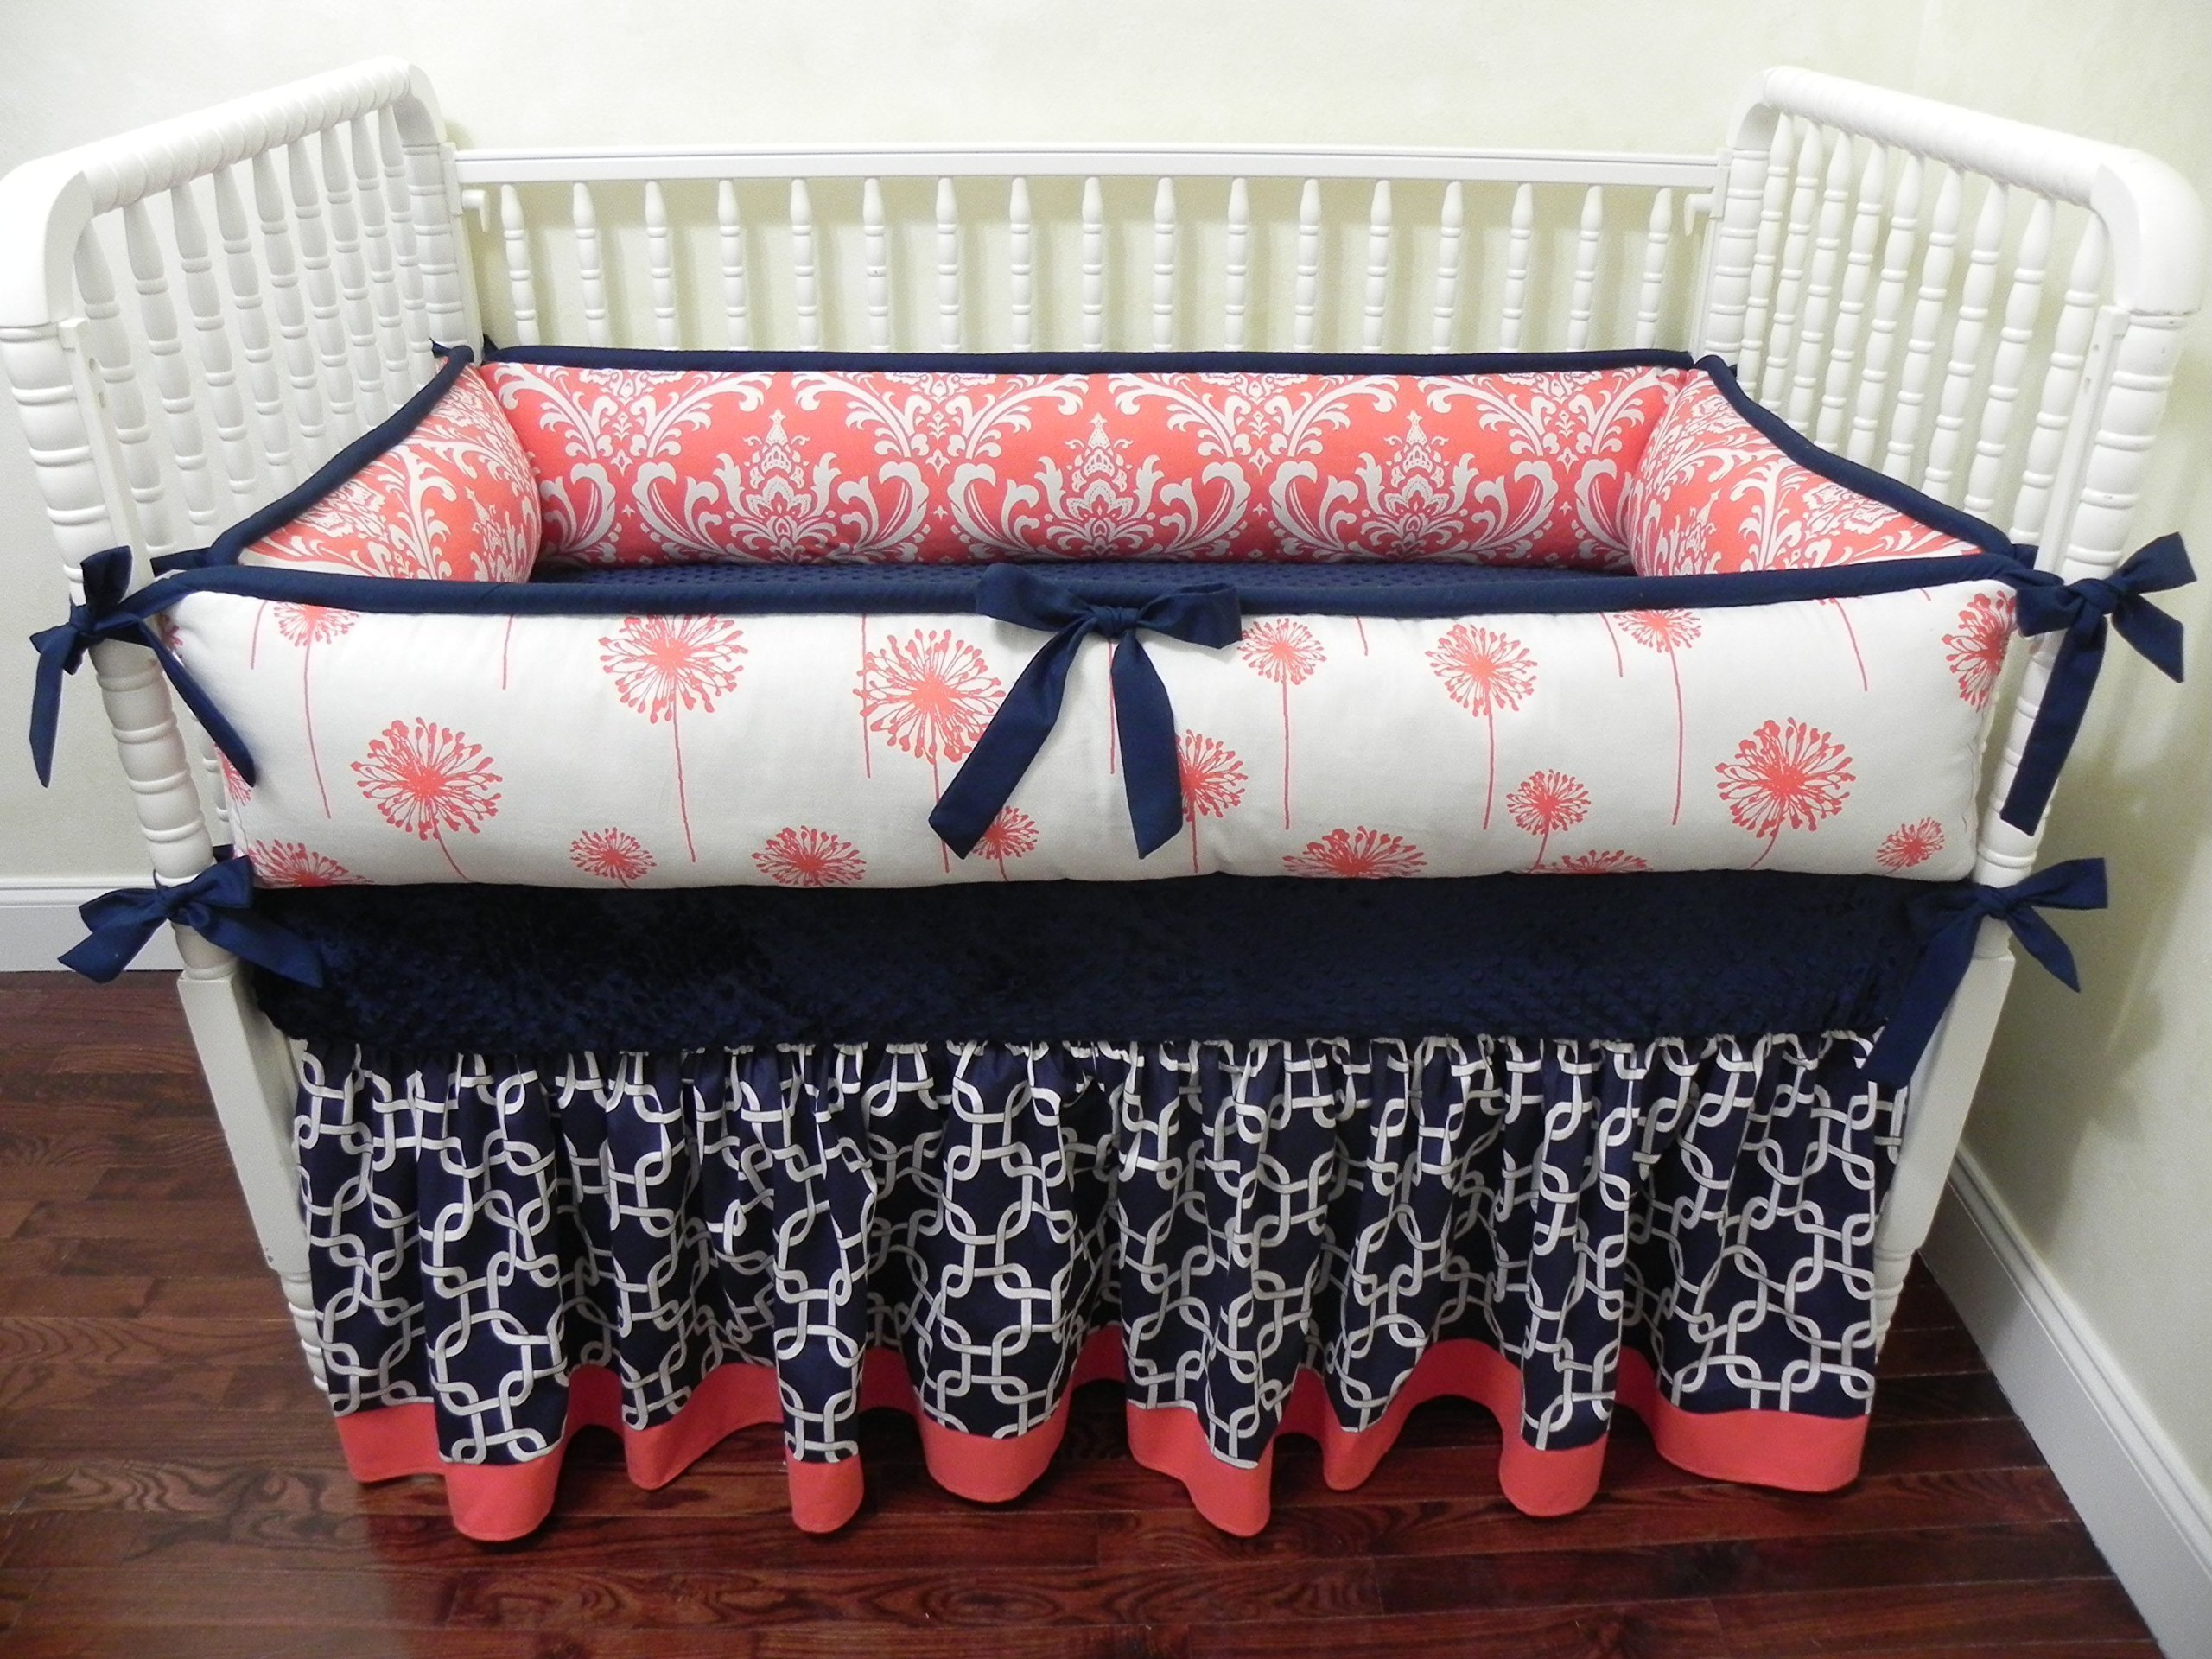 Nursery Bedding, Baby Crib Bedding Set Halle, Girl Baby Bedding, Coral and Navy Baby Bedding - Choose Your Pieces